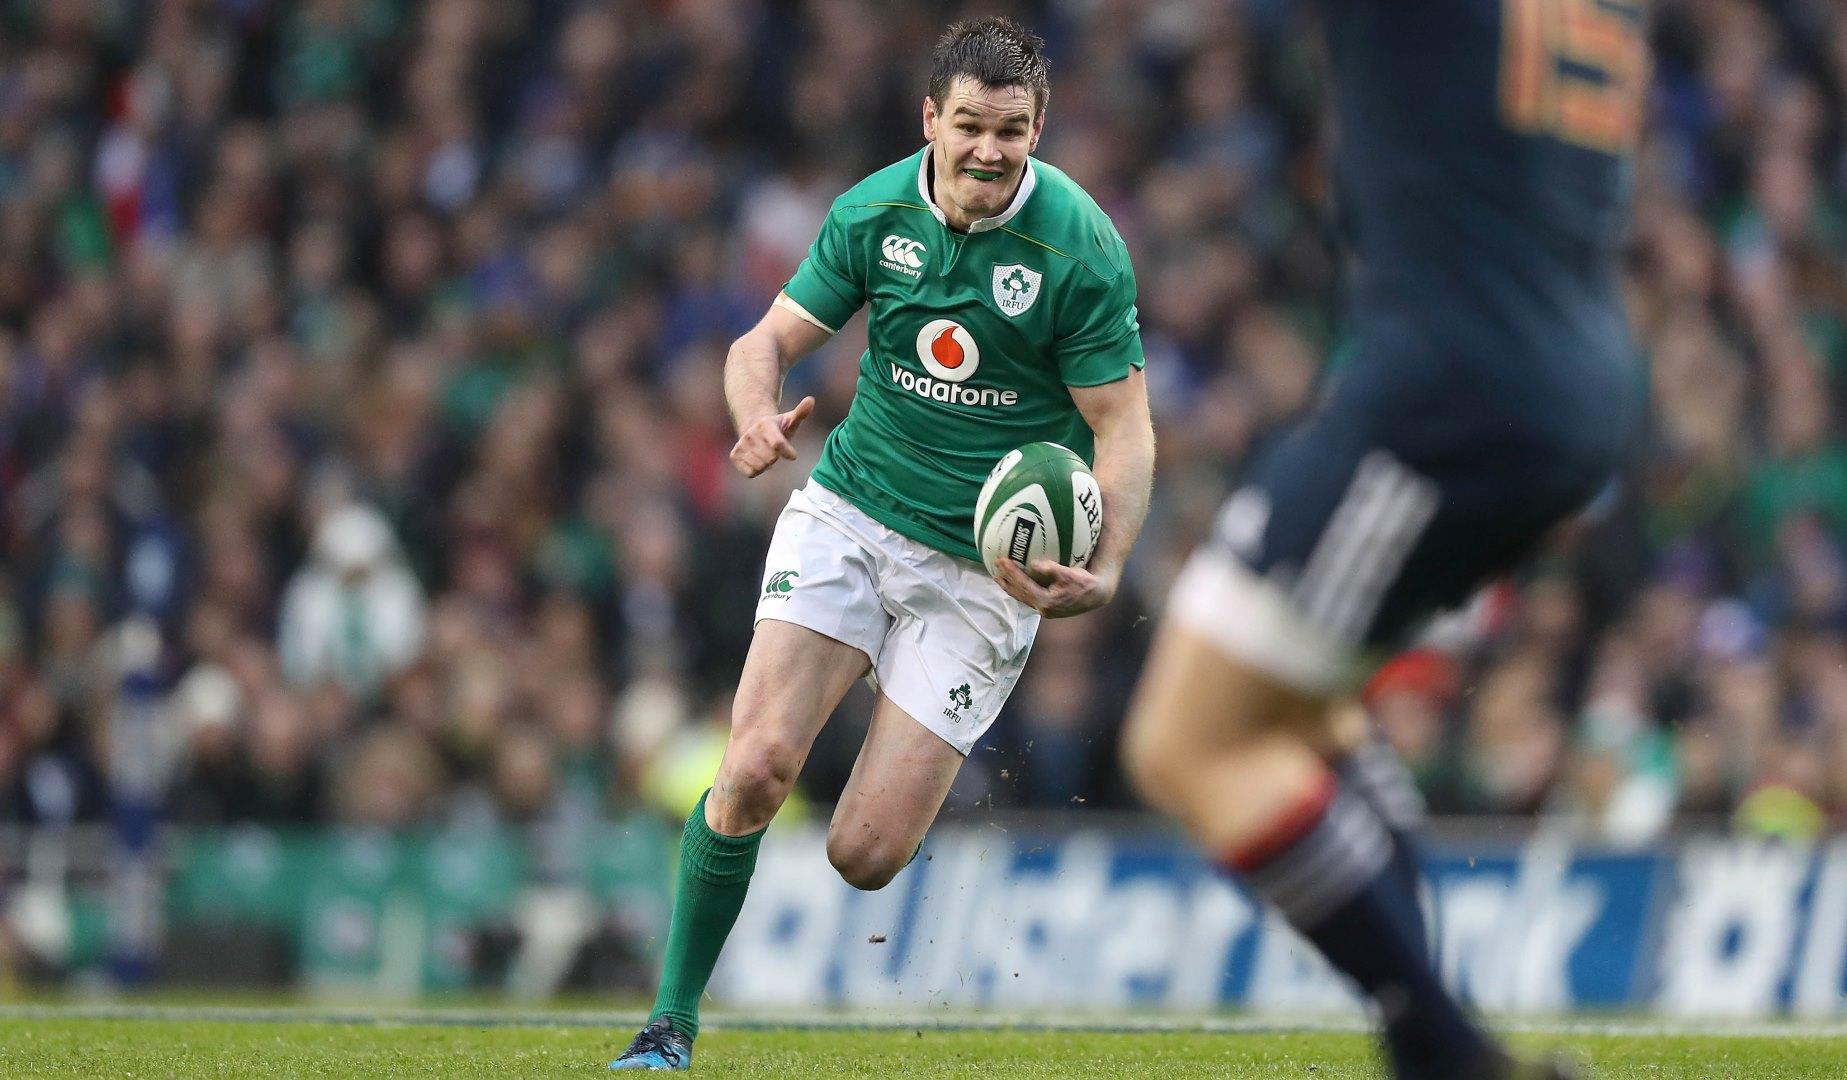 LionsWatch: Sexton returns to lead Ireland past France